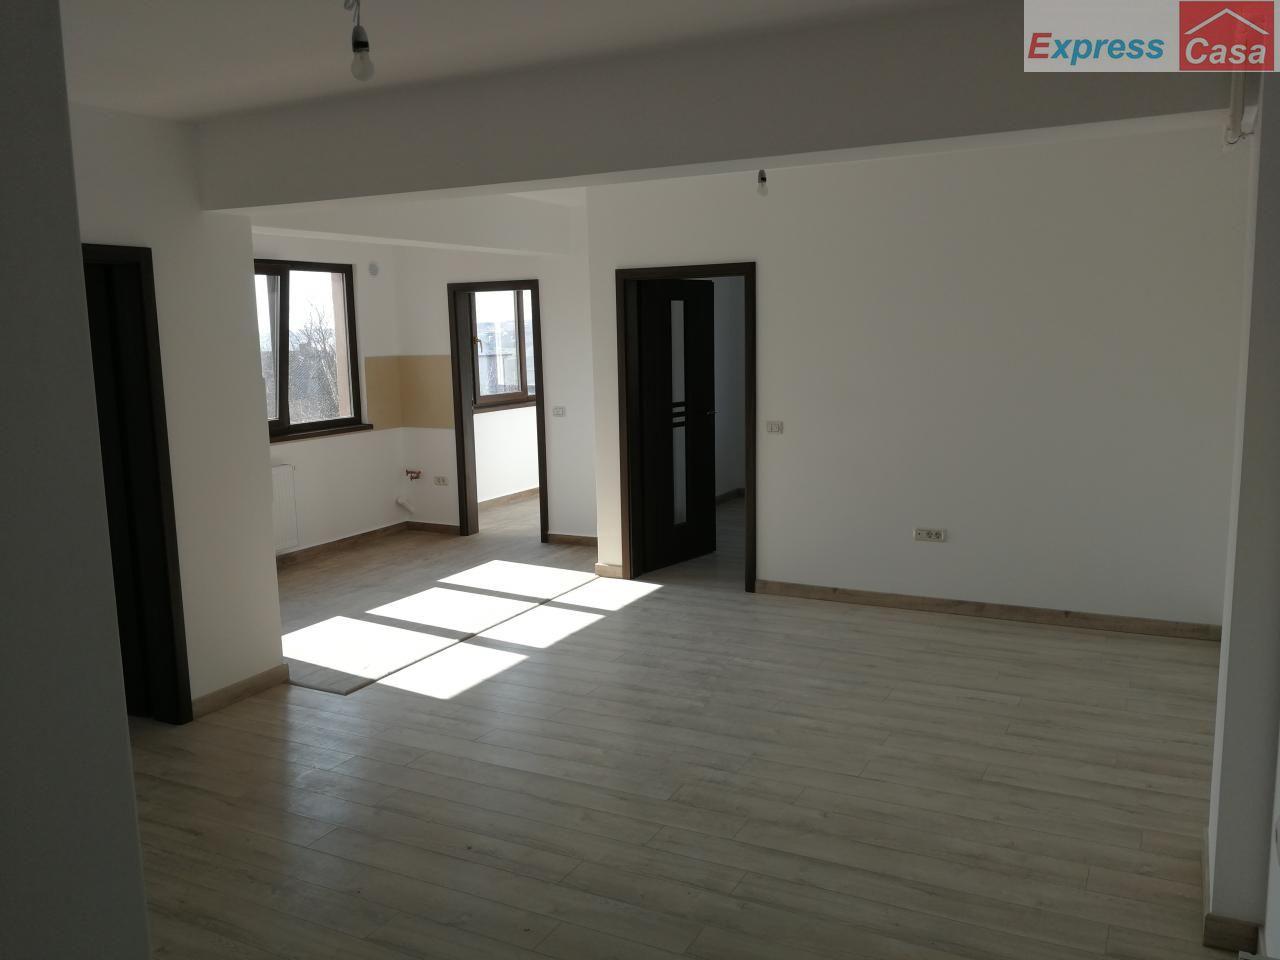 Apartament de vanzare, Iași (judet), Nicolina 1 - Foto 3